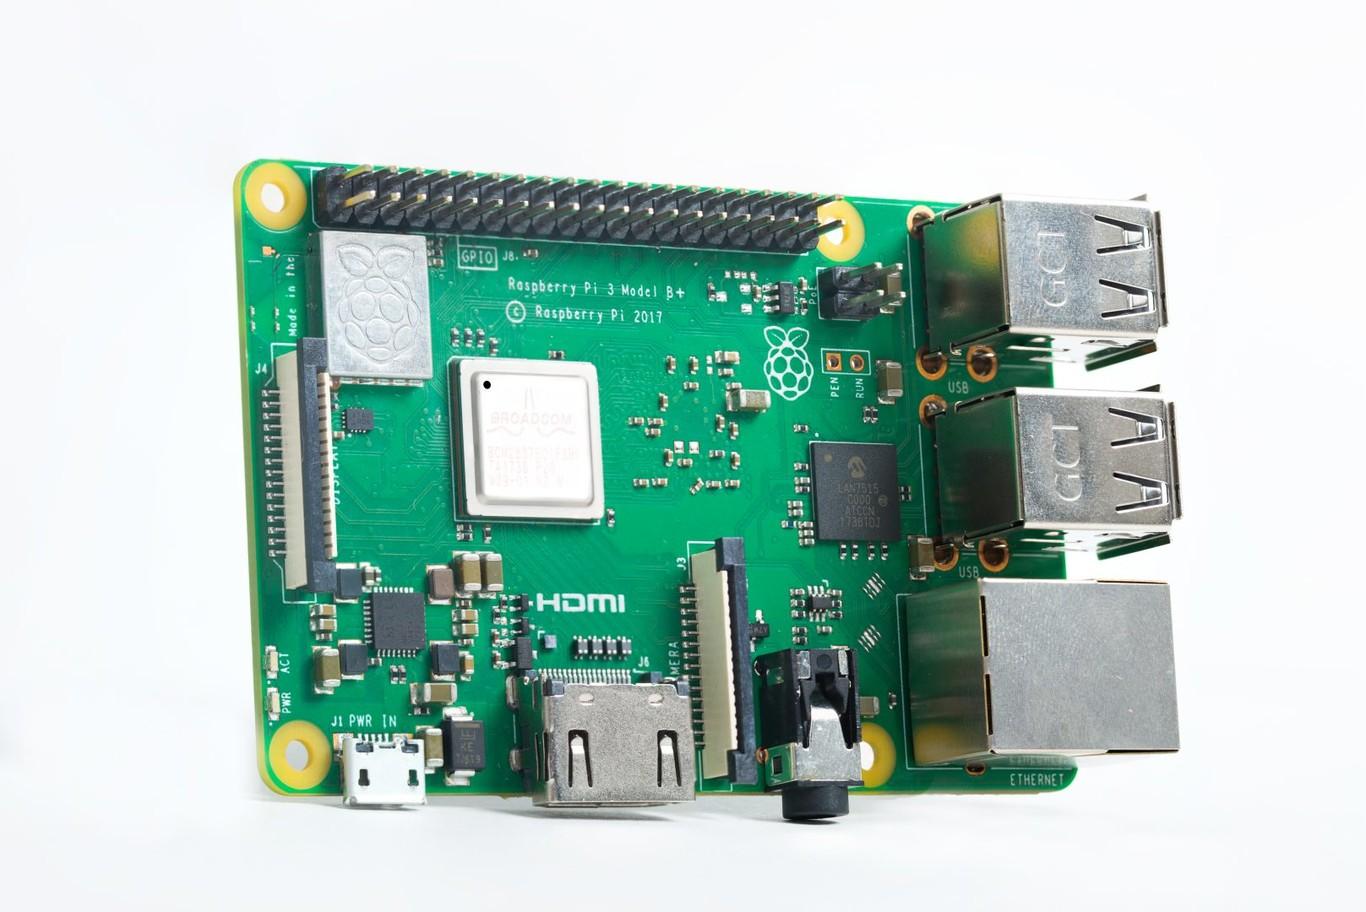 RaspberryPI3Bplus